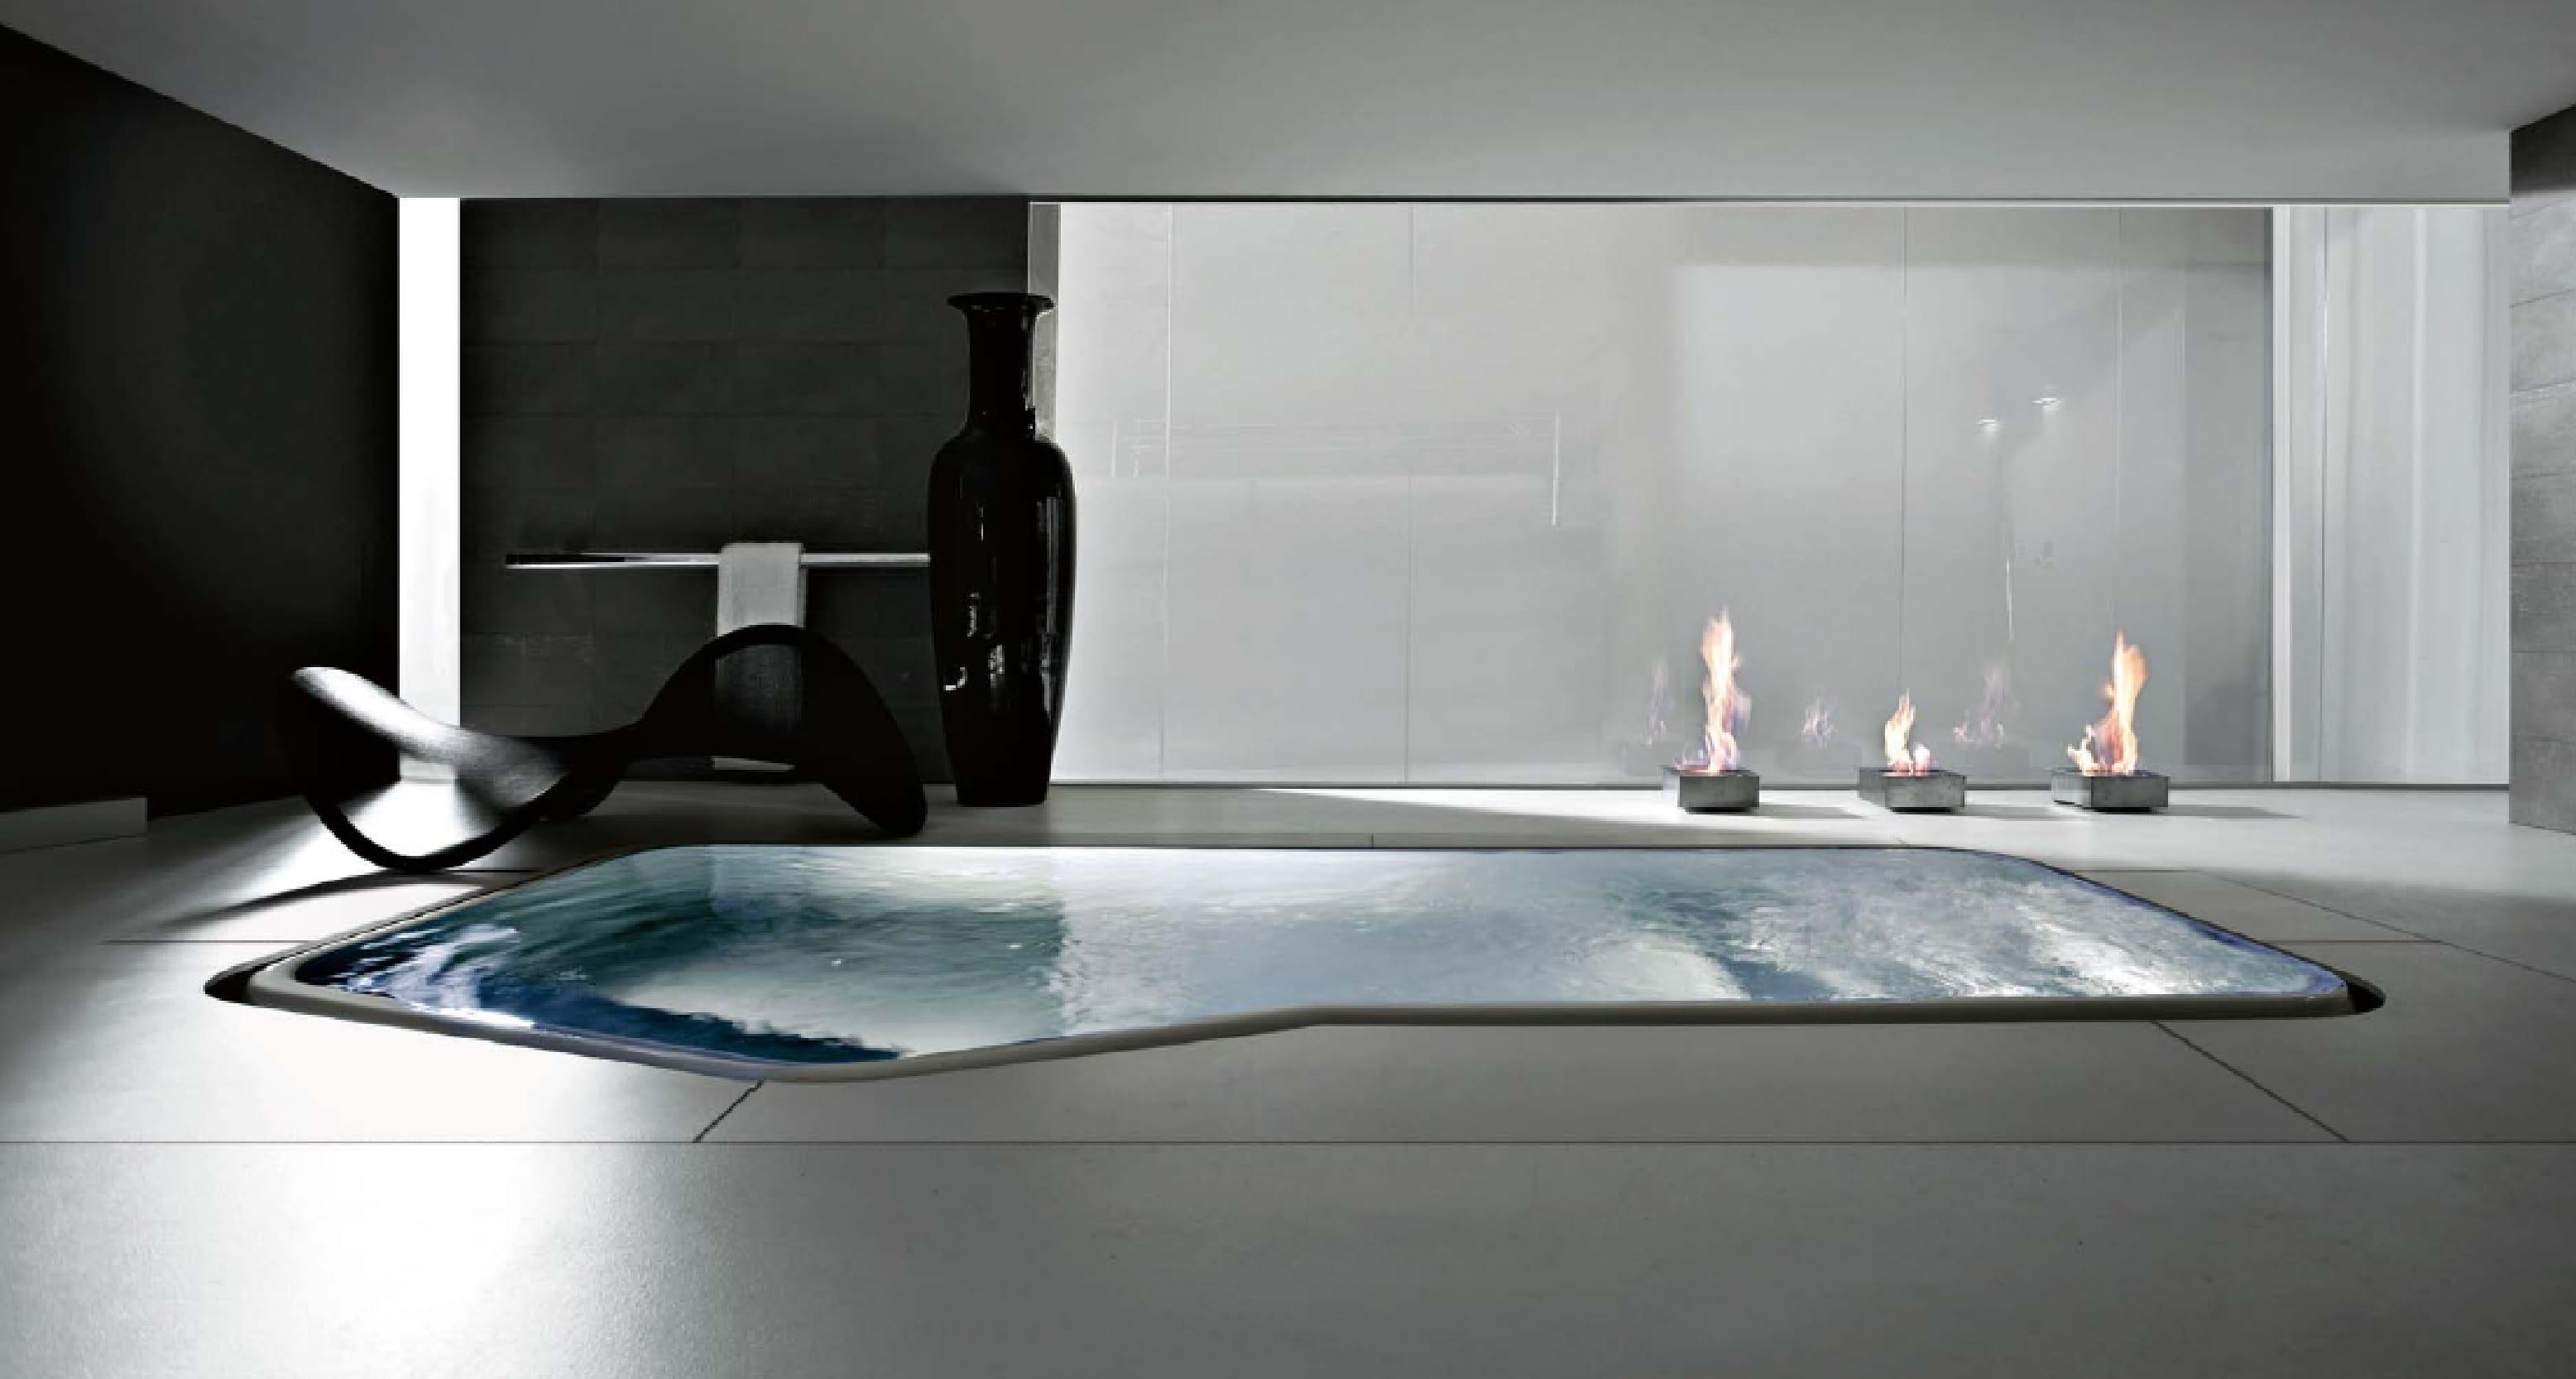 minimalistisches badezimmer- whirlpool - fresHouse